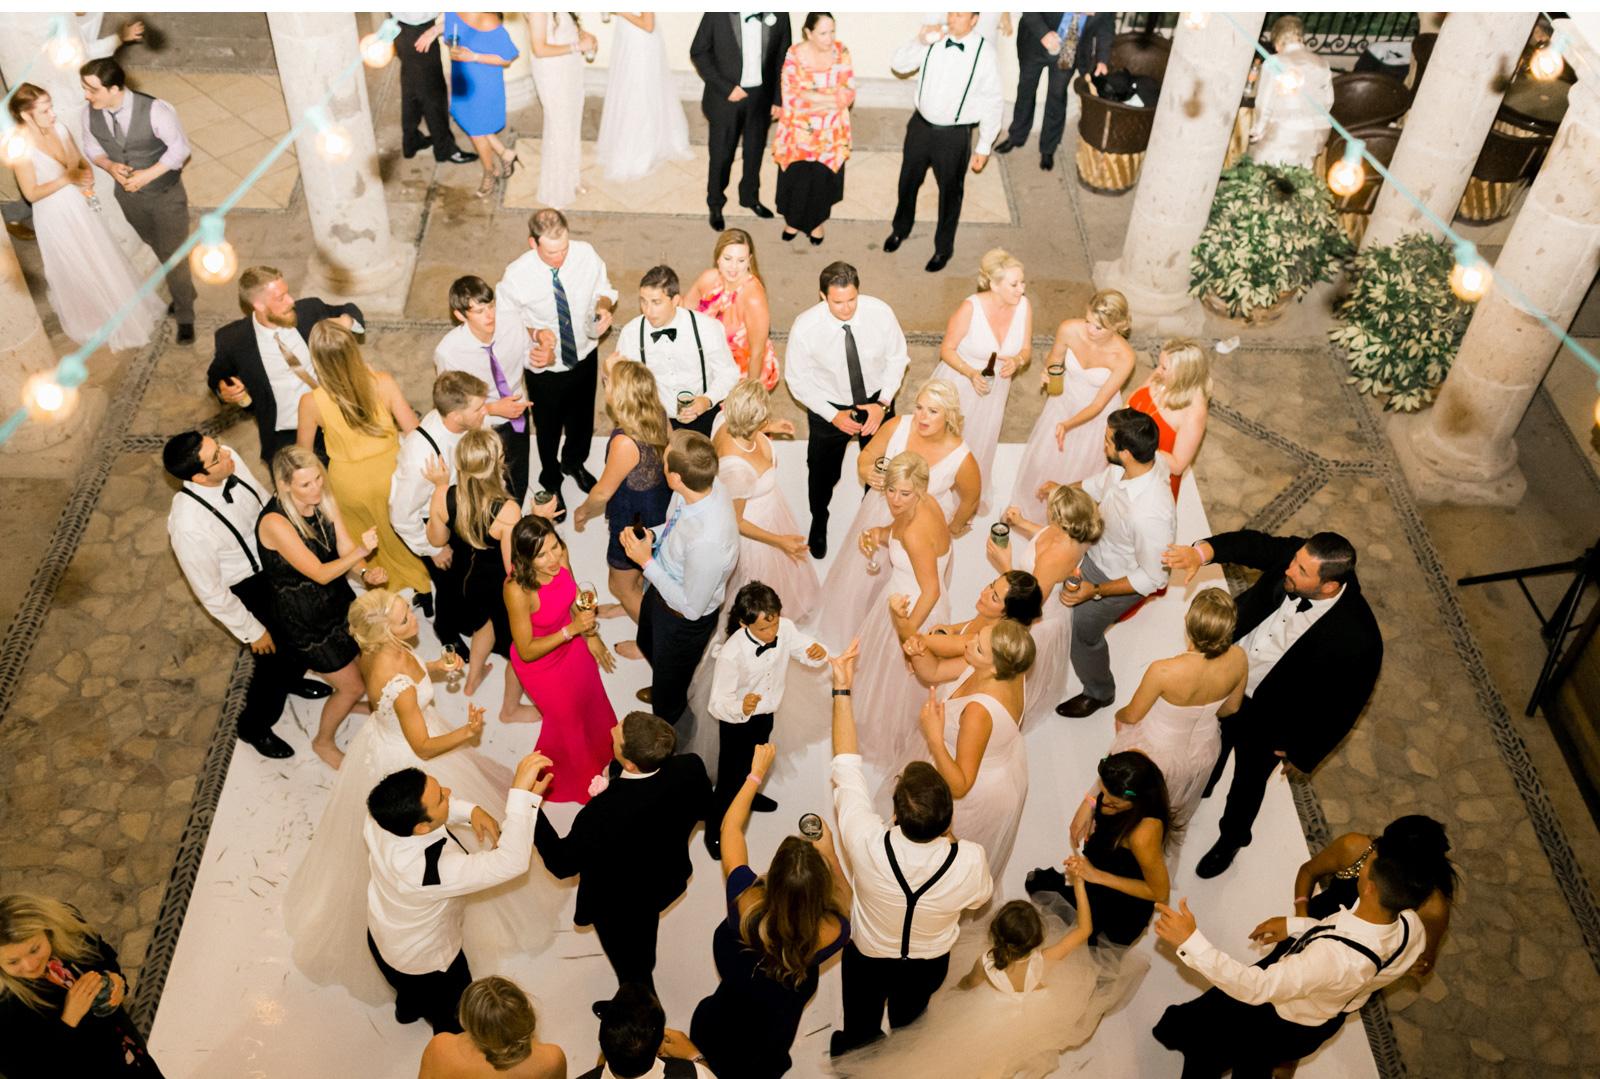 Cabo-Destination-Wedding-Natalie-Schutt-Photography_11.jpg